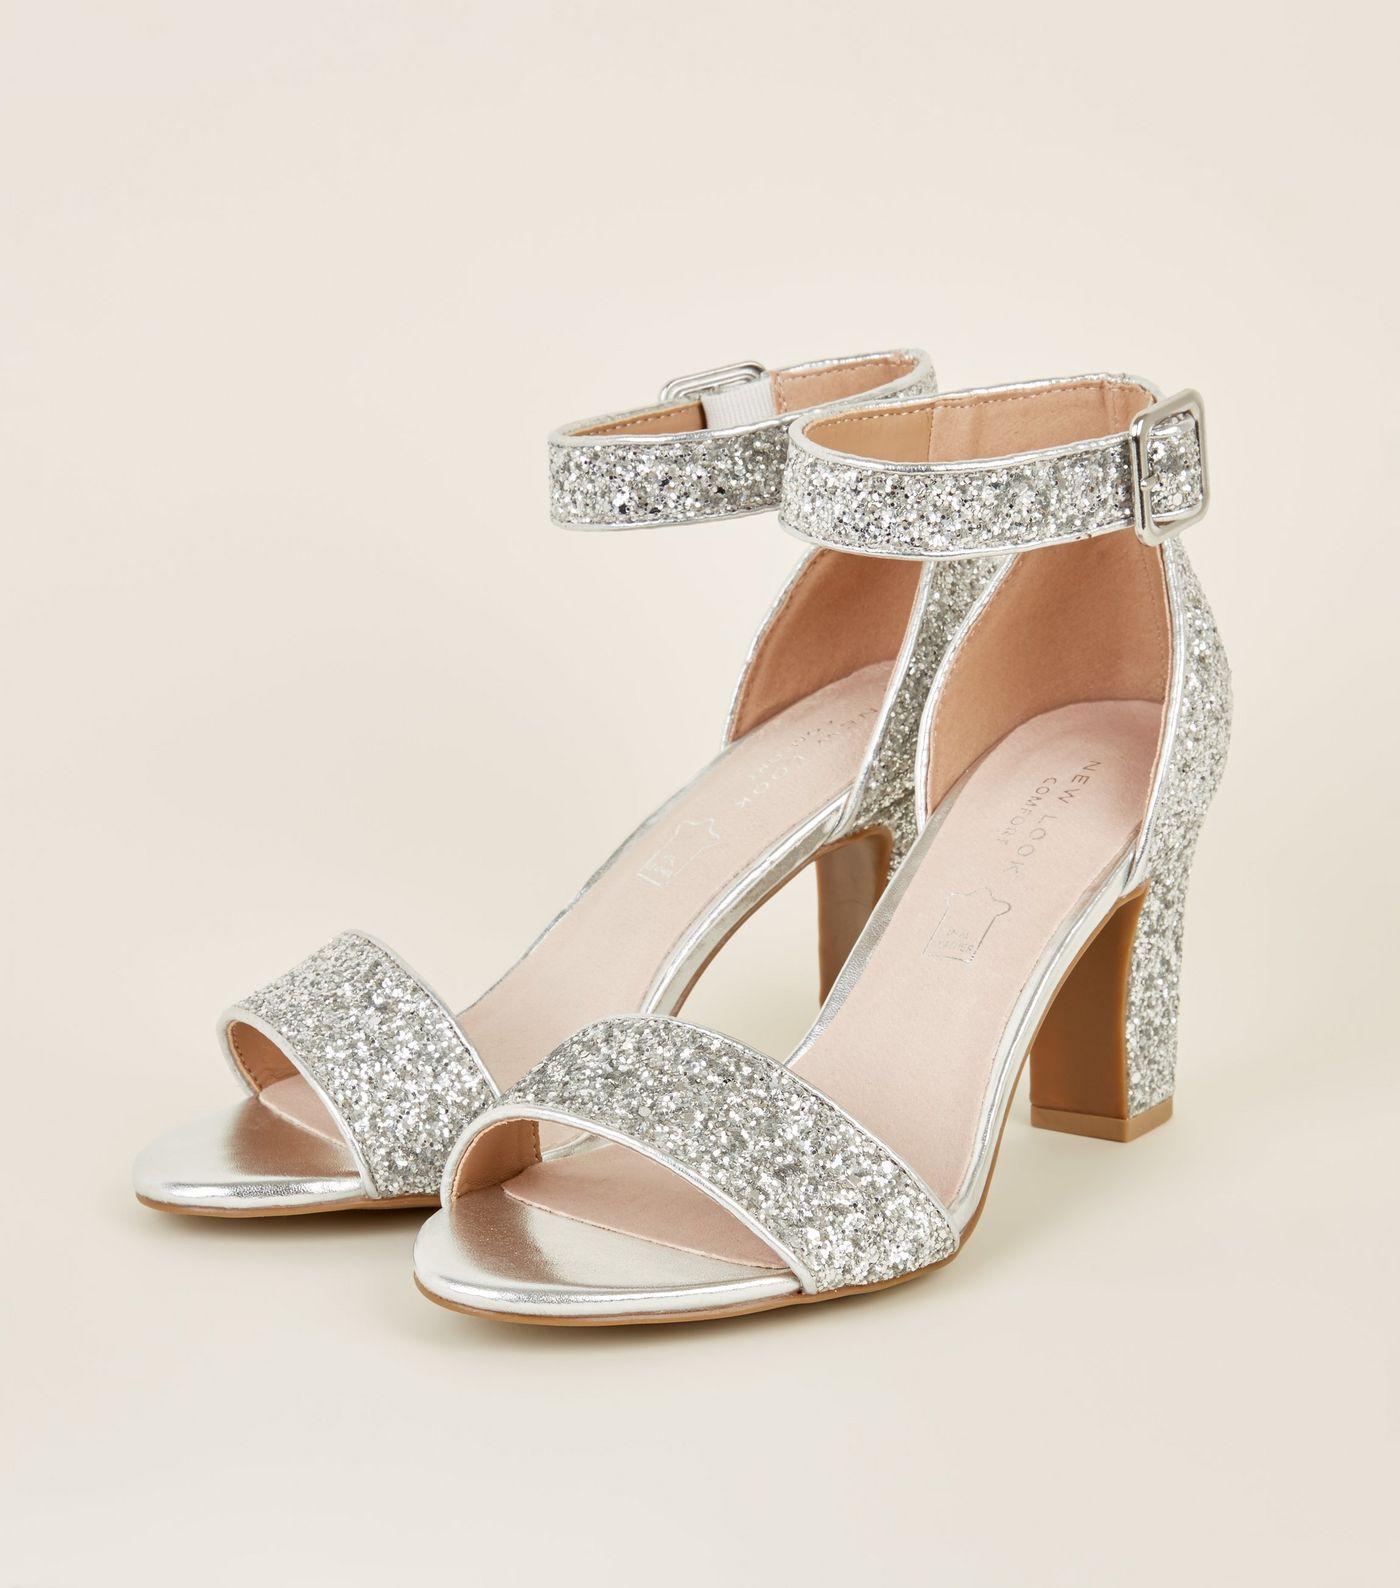 d2dbdd448190 Comfort Flex Silver Glittery Block Heels